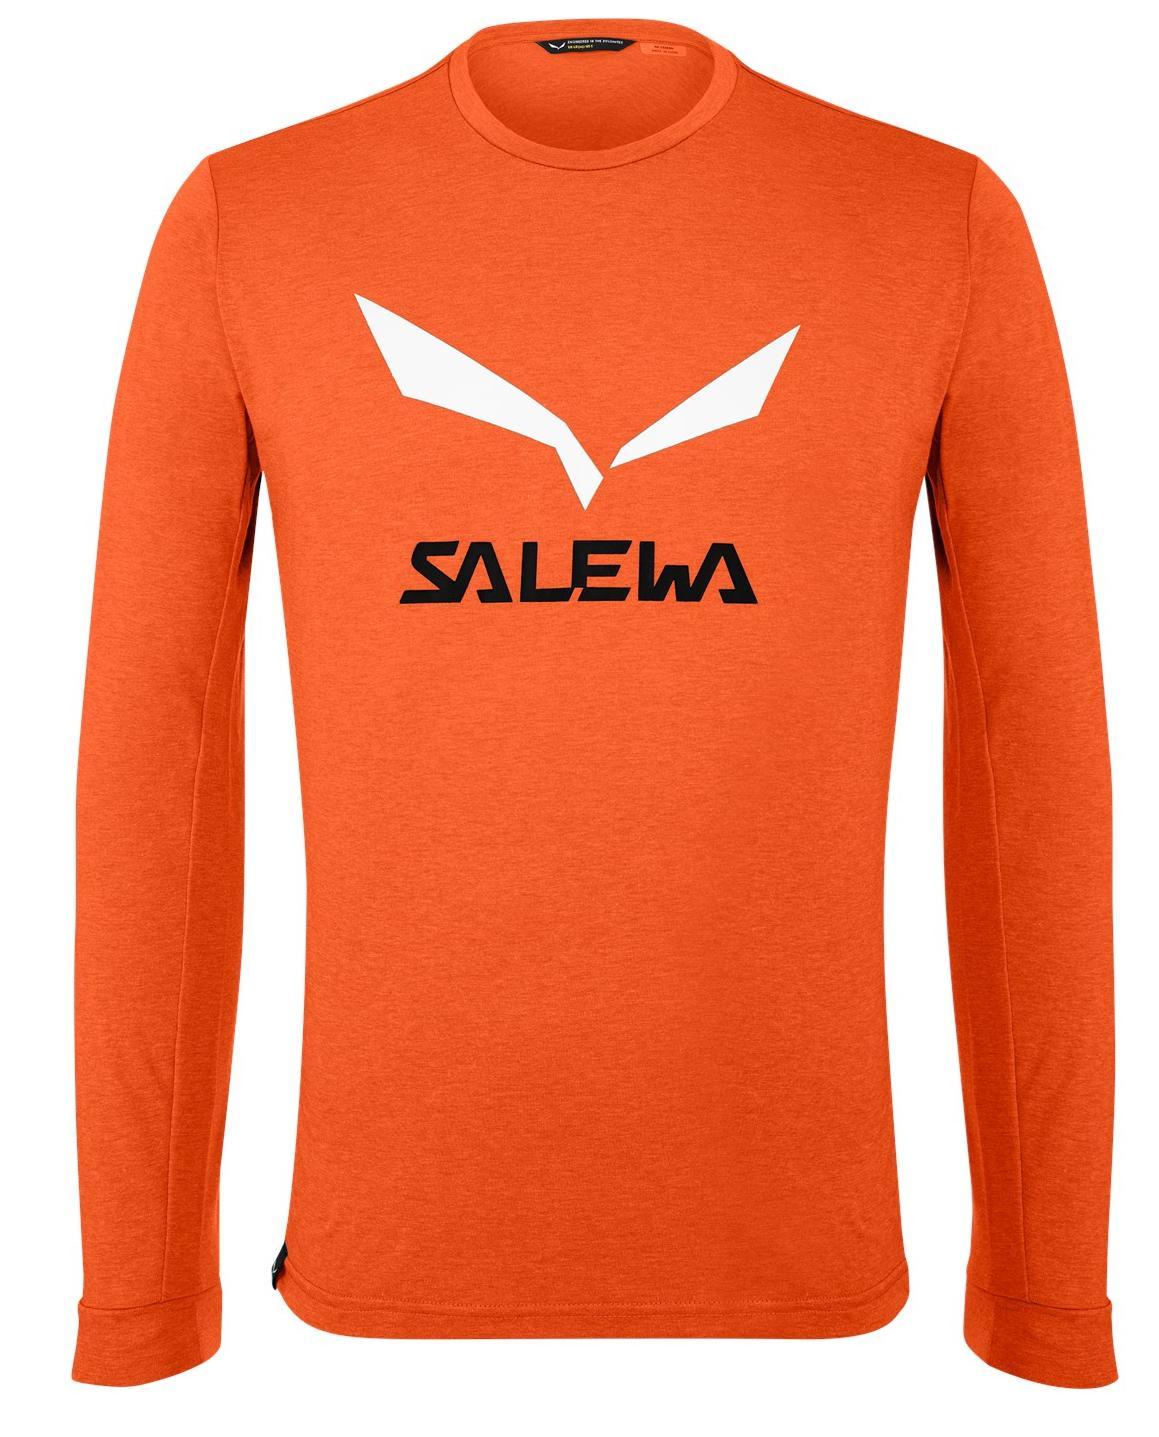 Лонгслив мужской Salewa 00-0000027340 оранжевый 52 RU